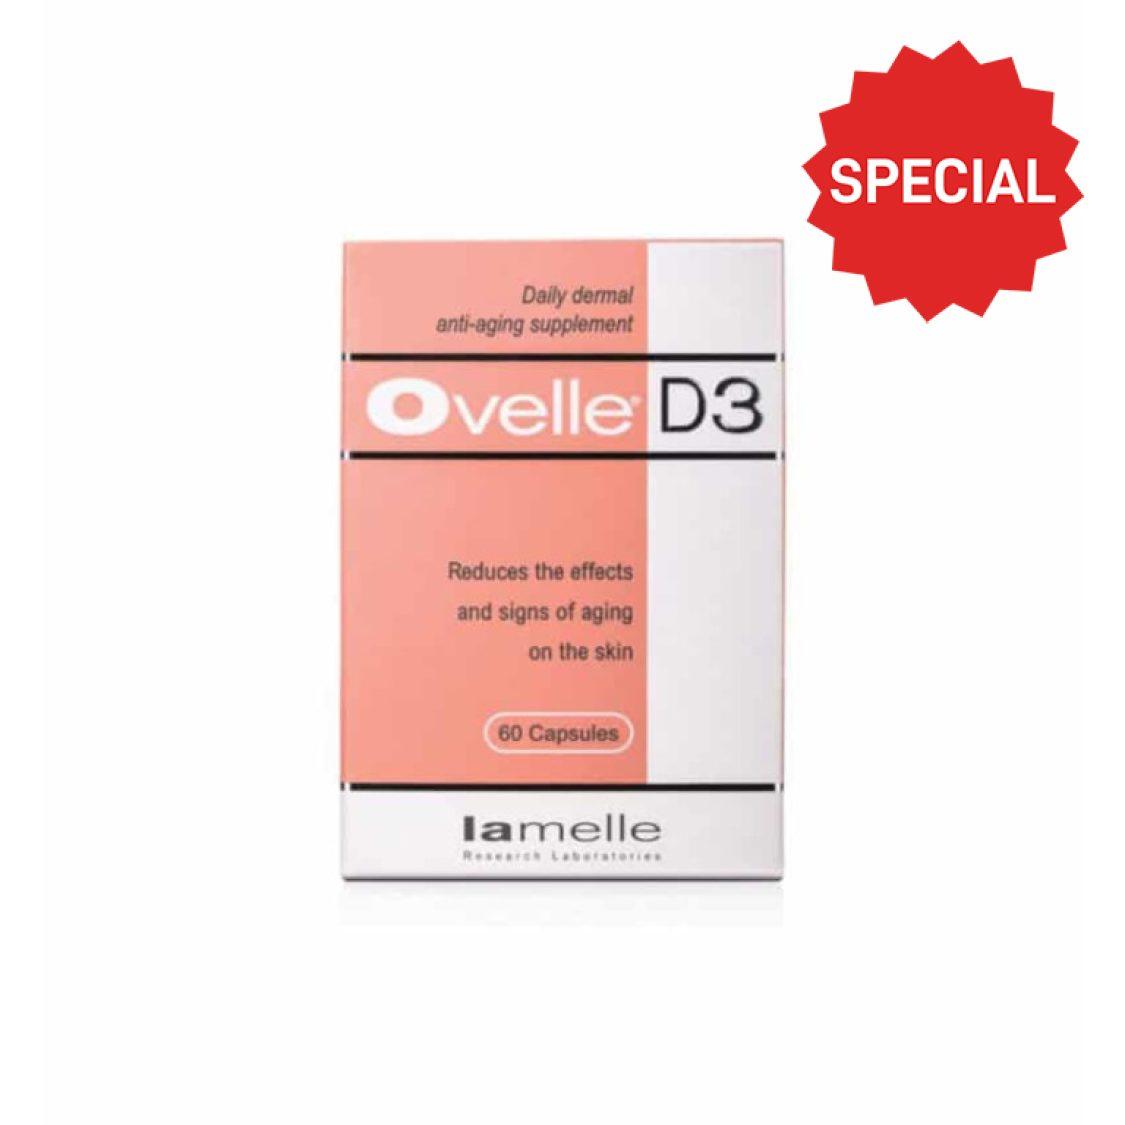 Lamelle - Ovelle®D3 60 capsules